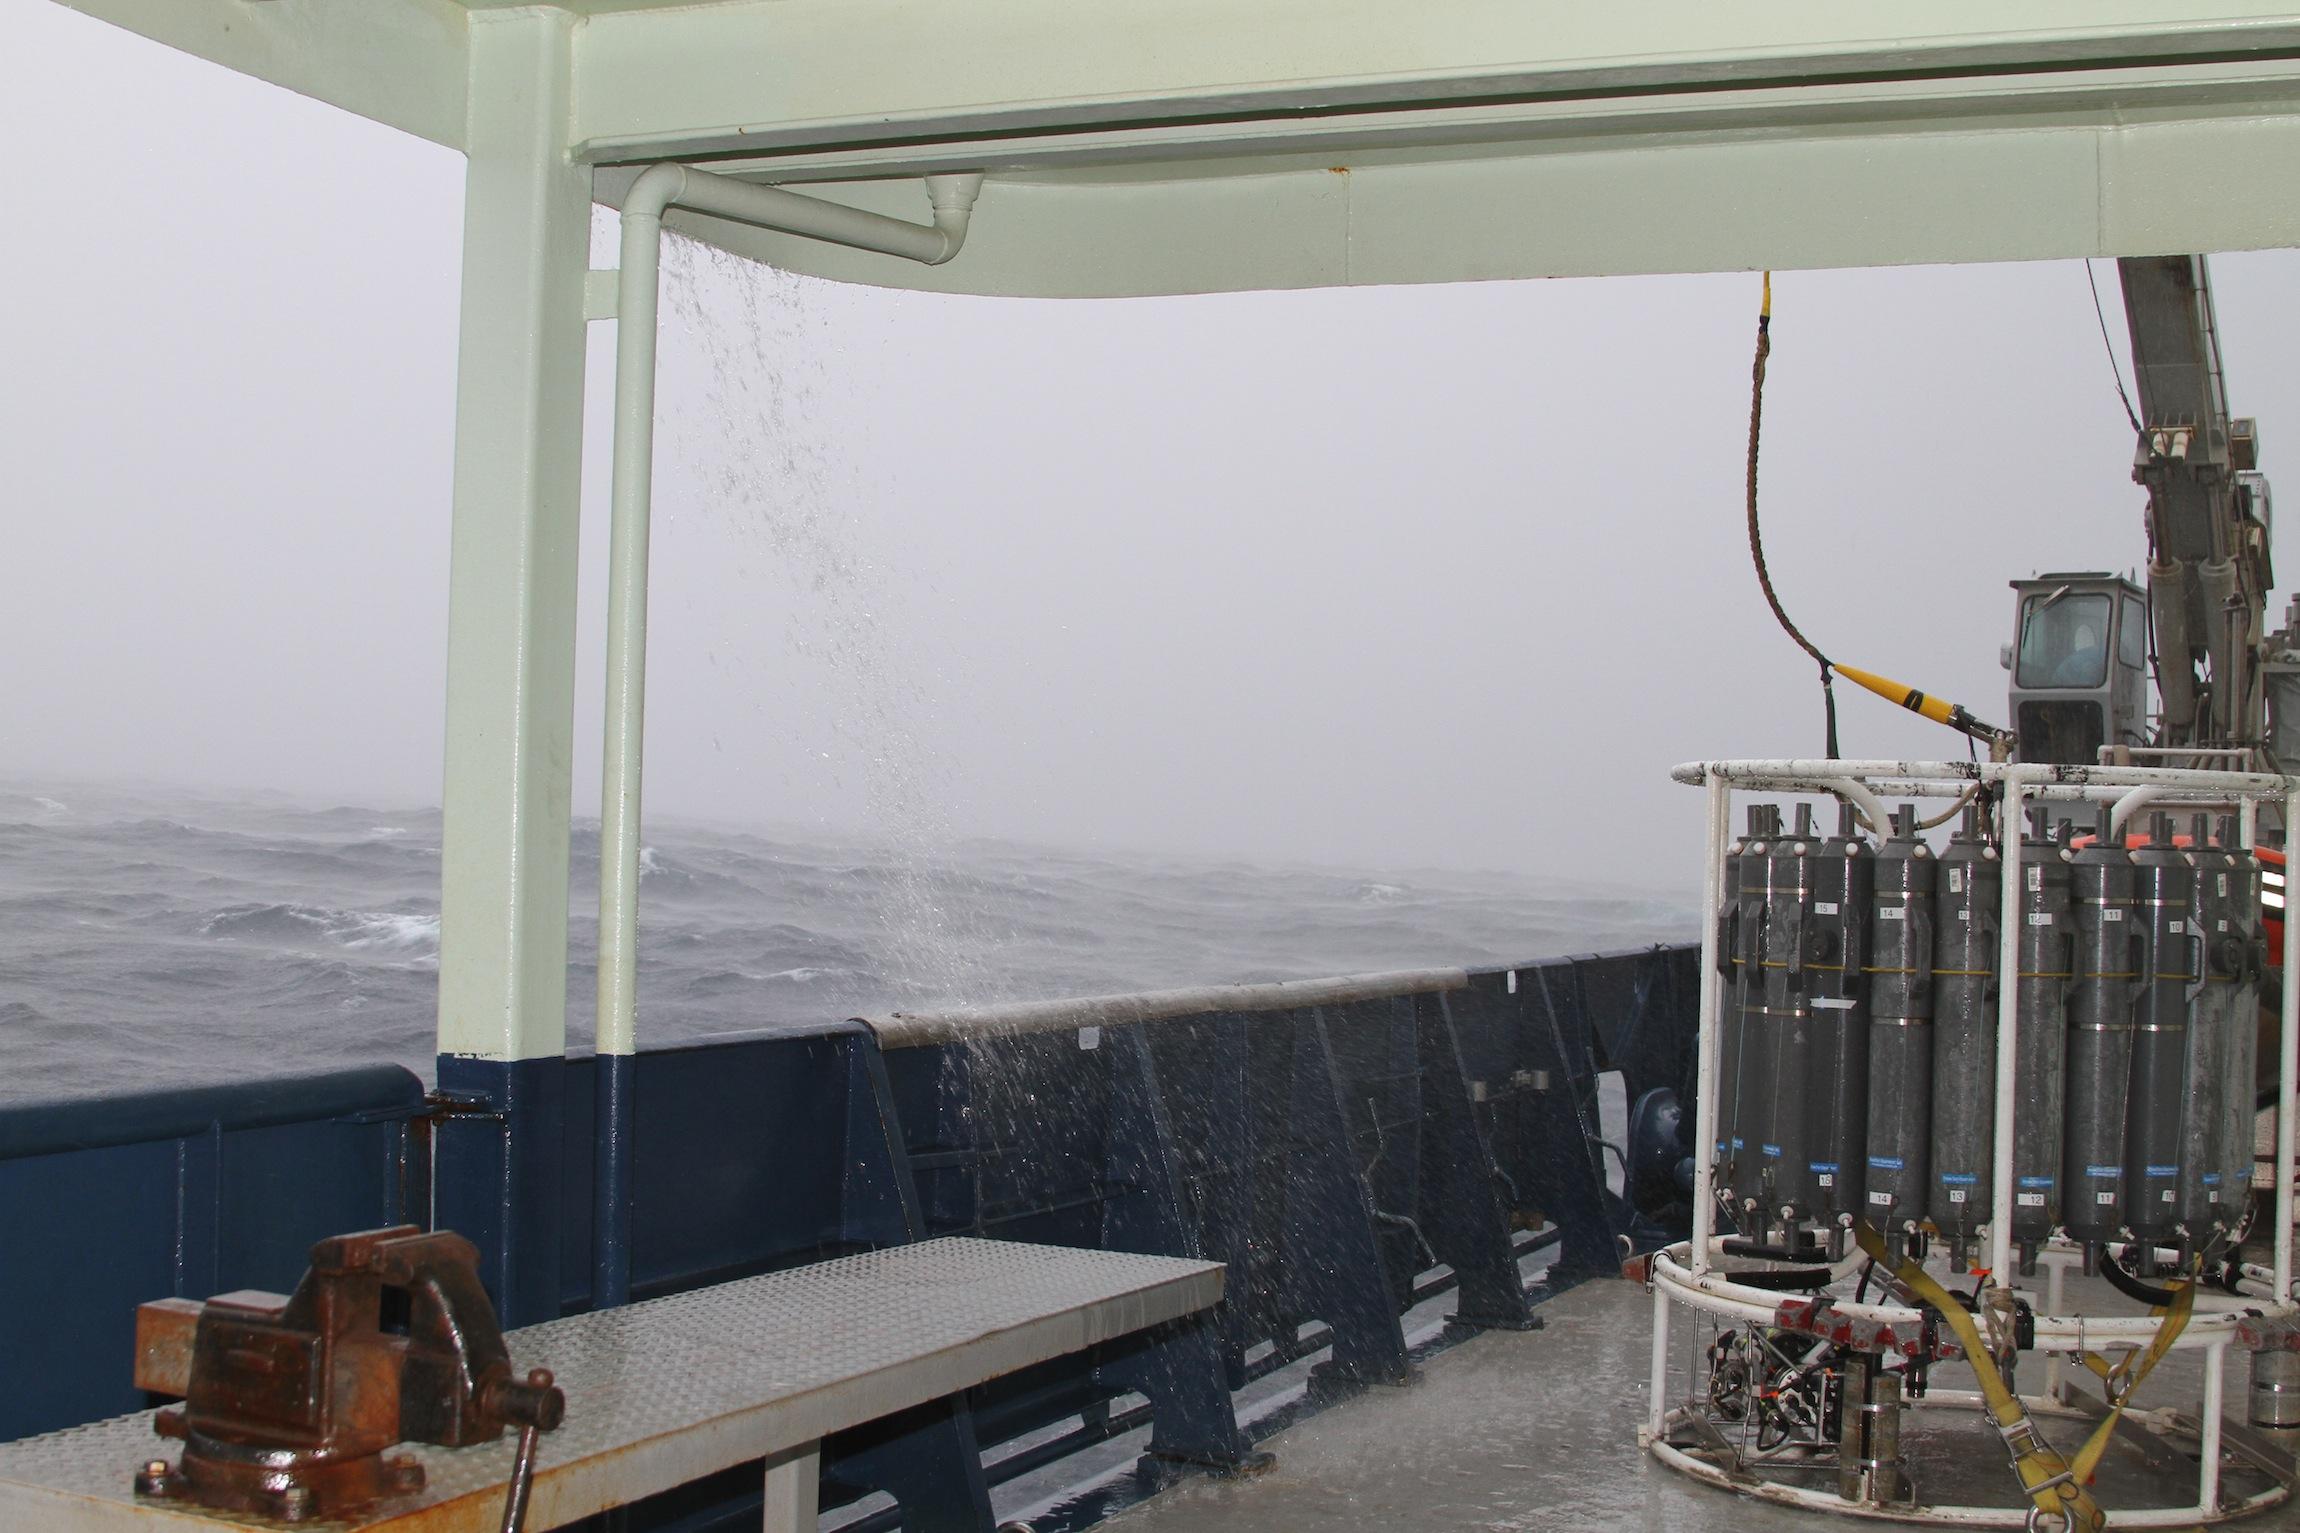 5a-rain around the CTD.JPG